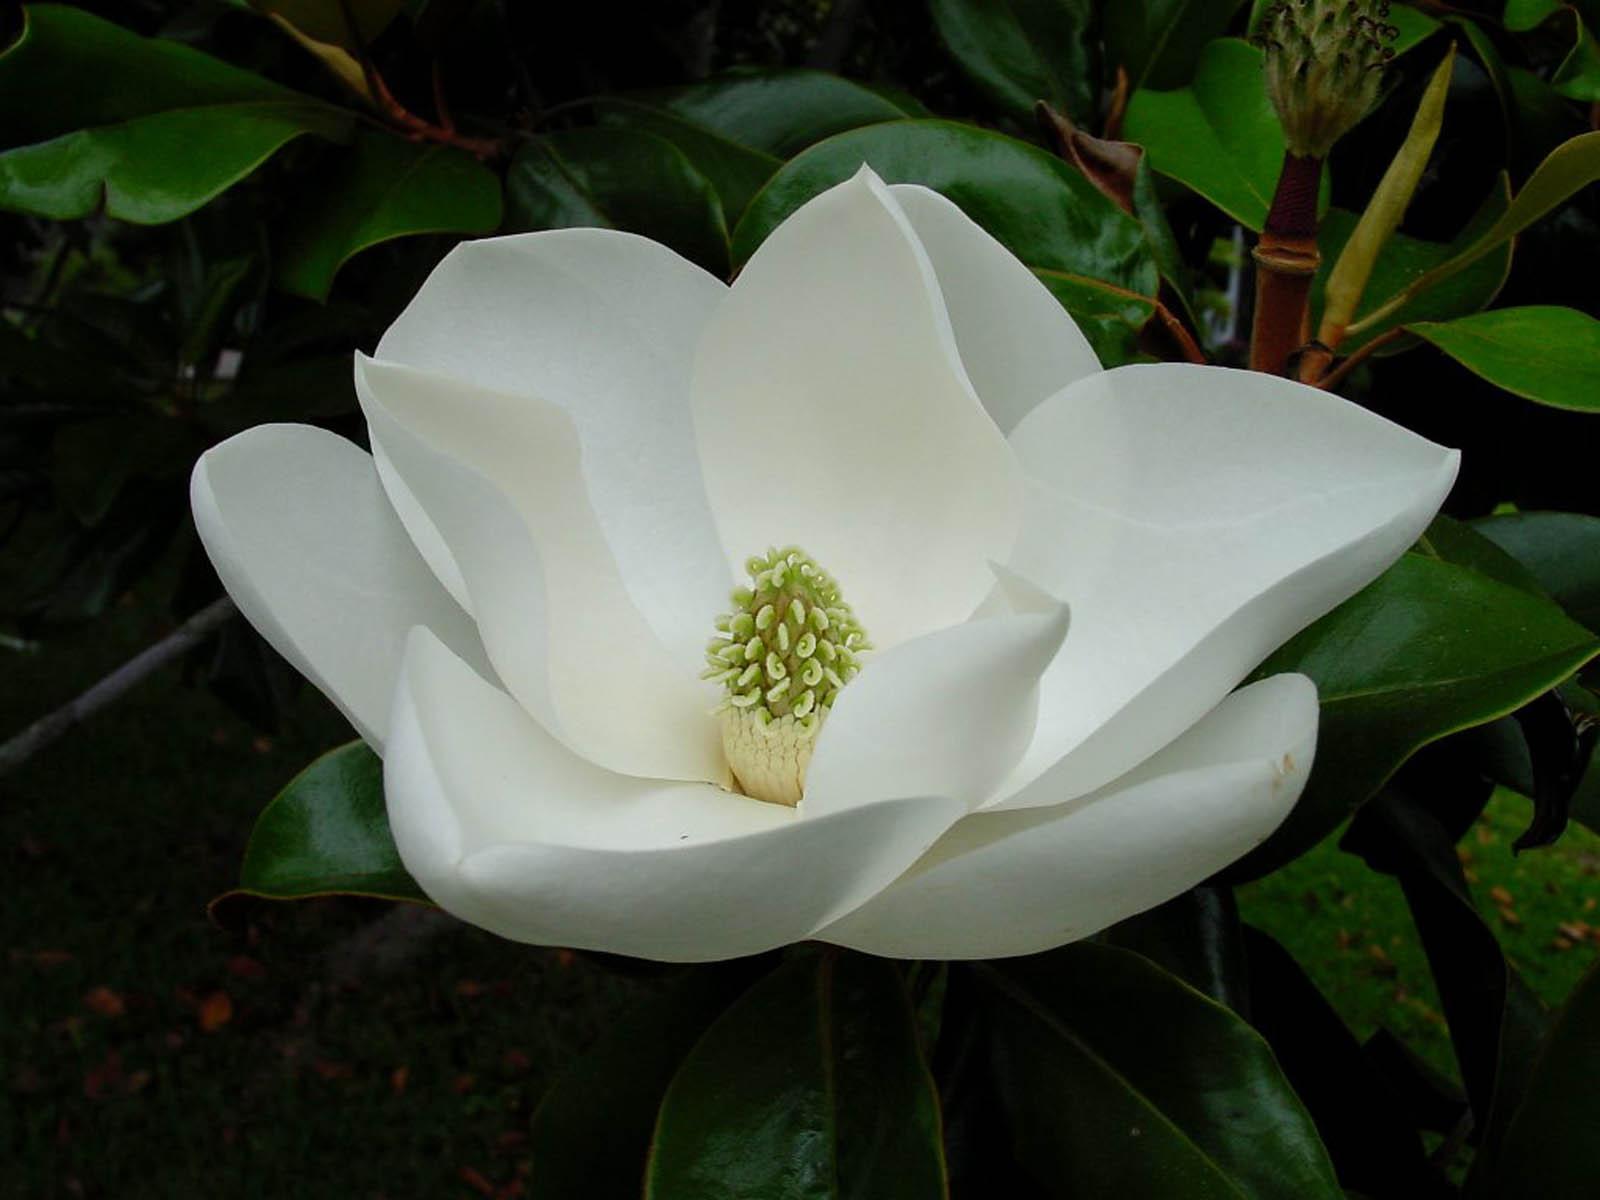 gardenia magnolia wallpaper - photo #26